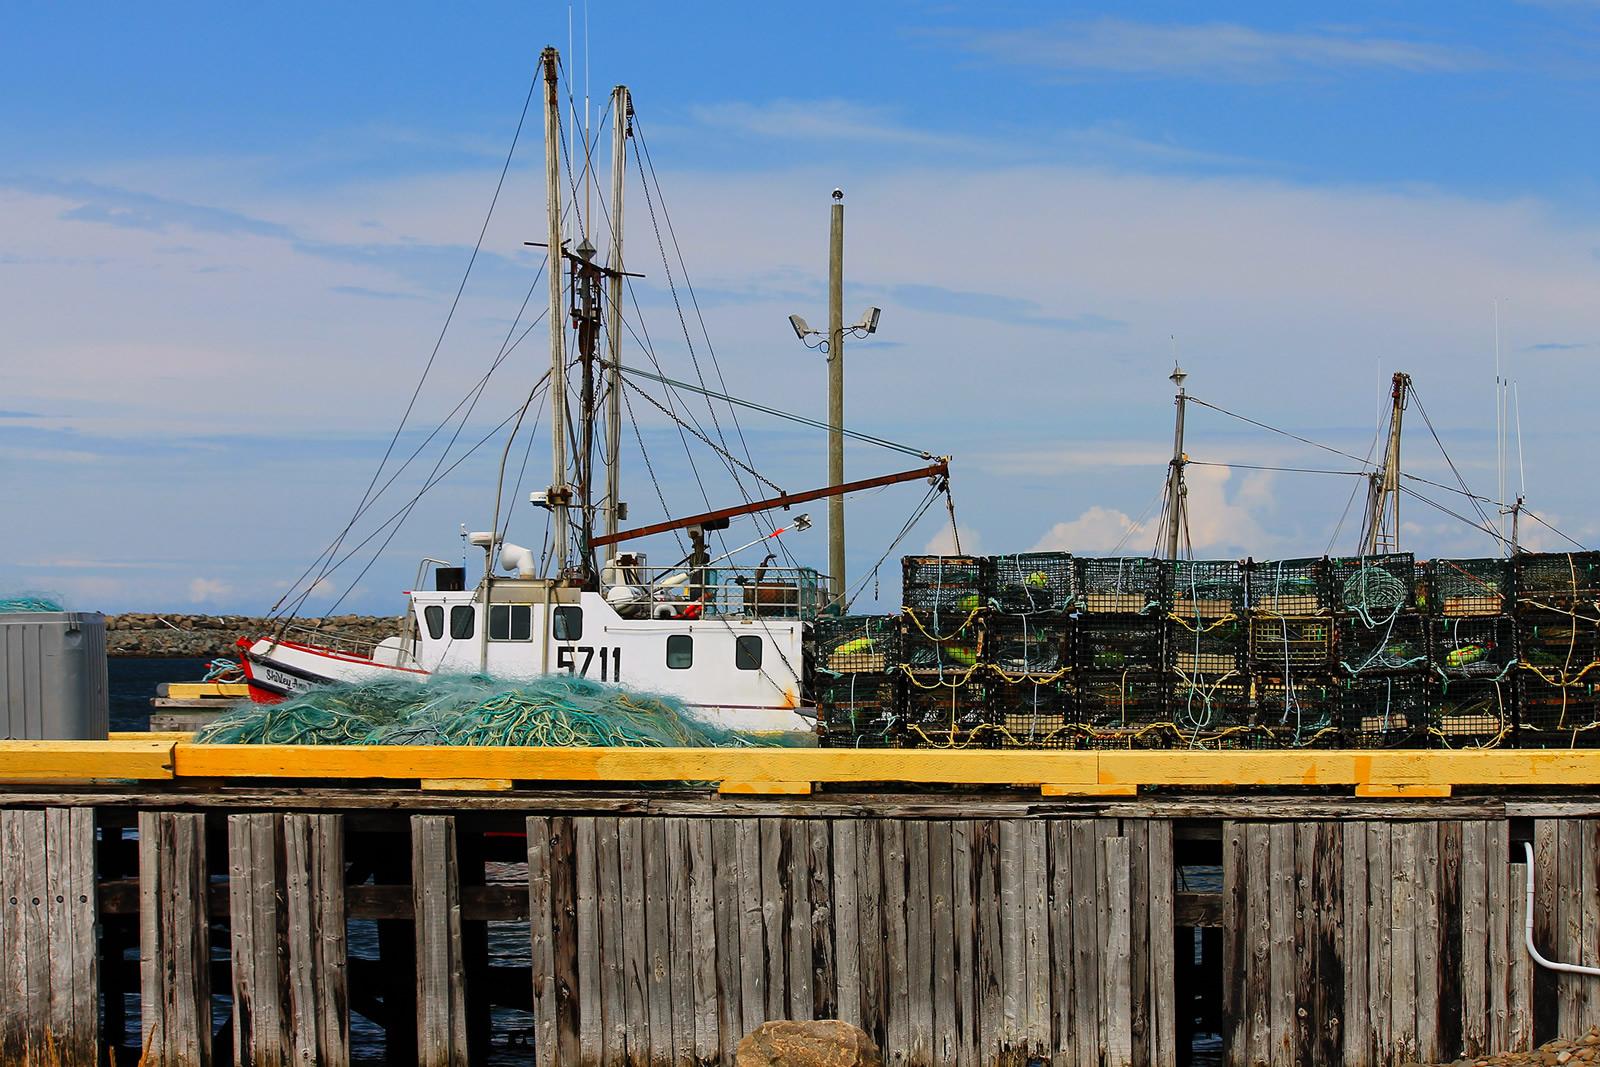 Newfoundland, Canada_Lobster traps.C.Poitevin